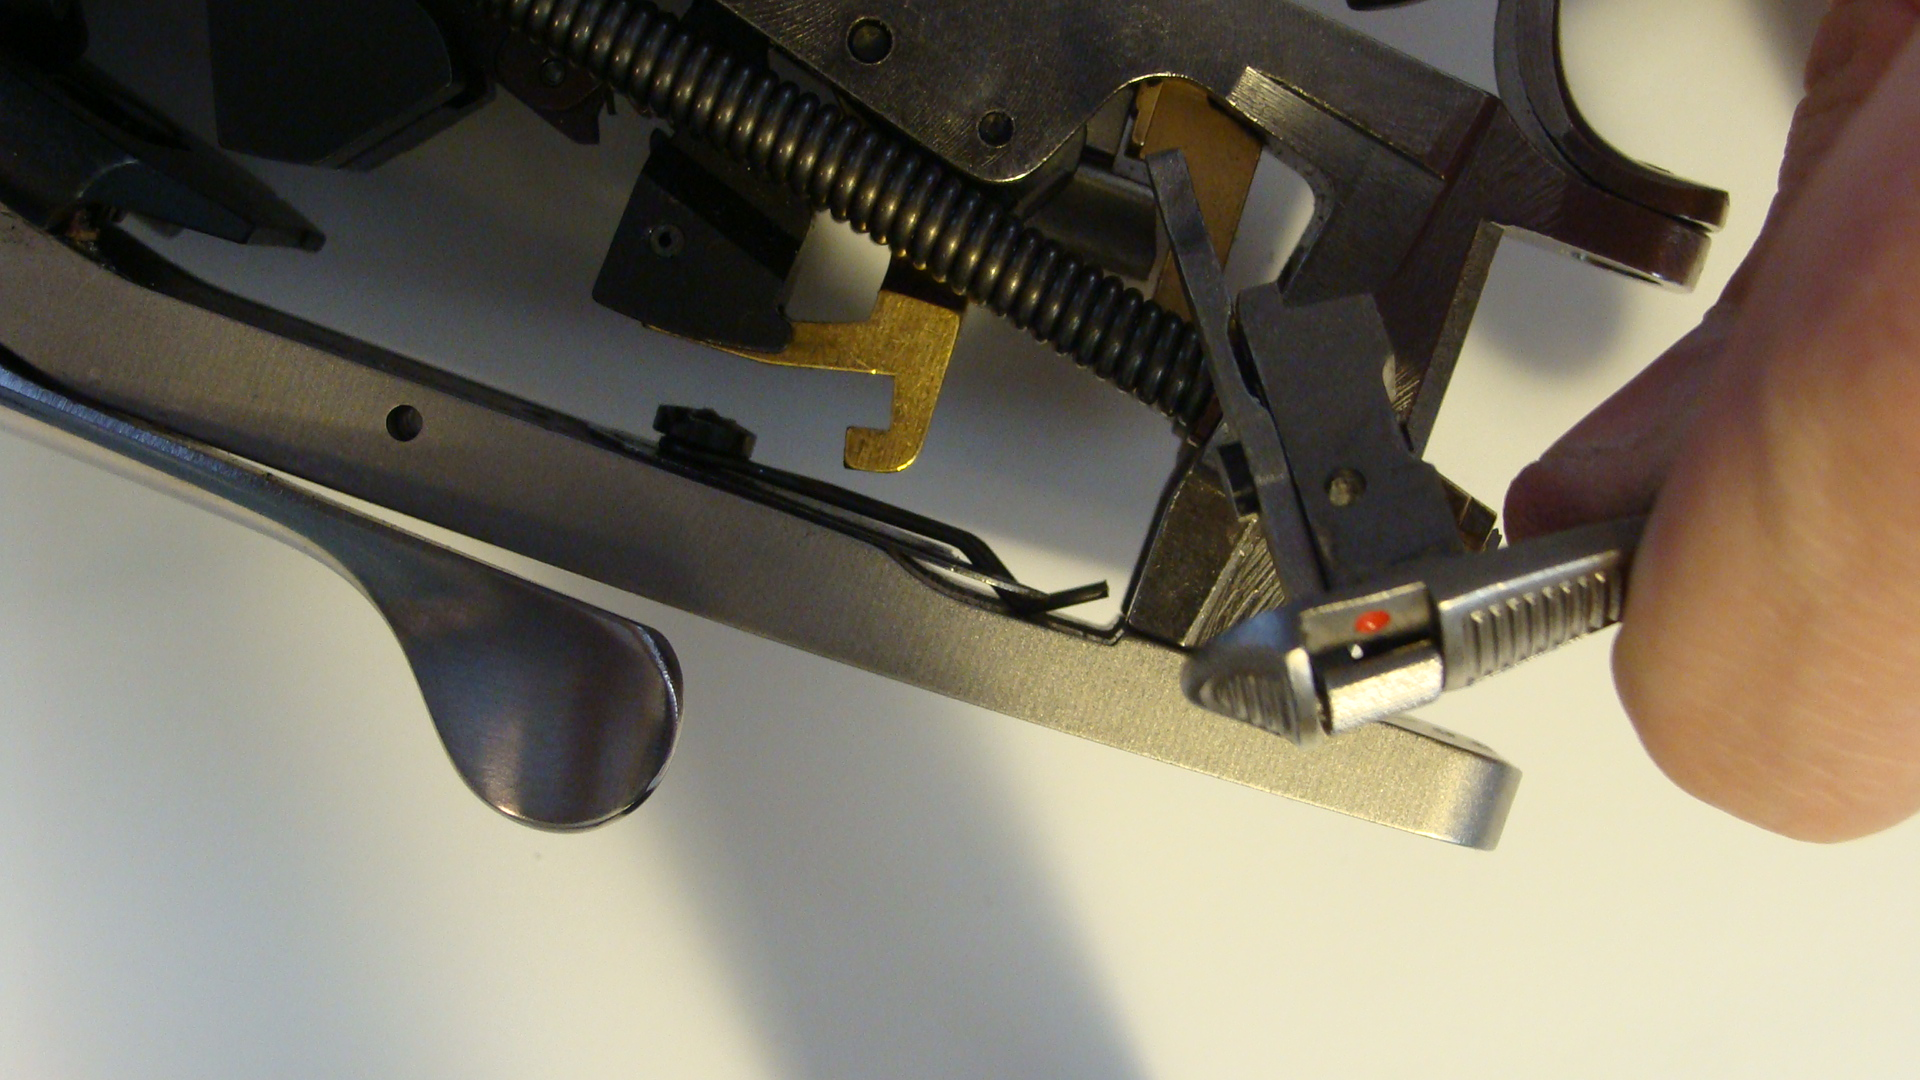 Auto-safety removal W/pics | Gun and Game - The Friendliest Gun